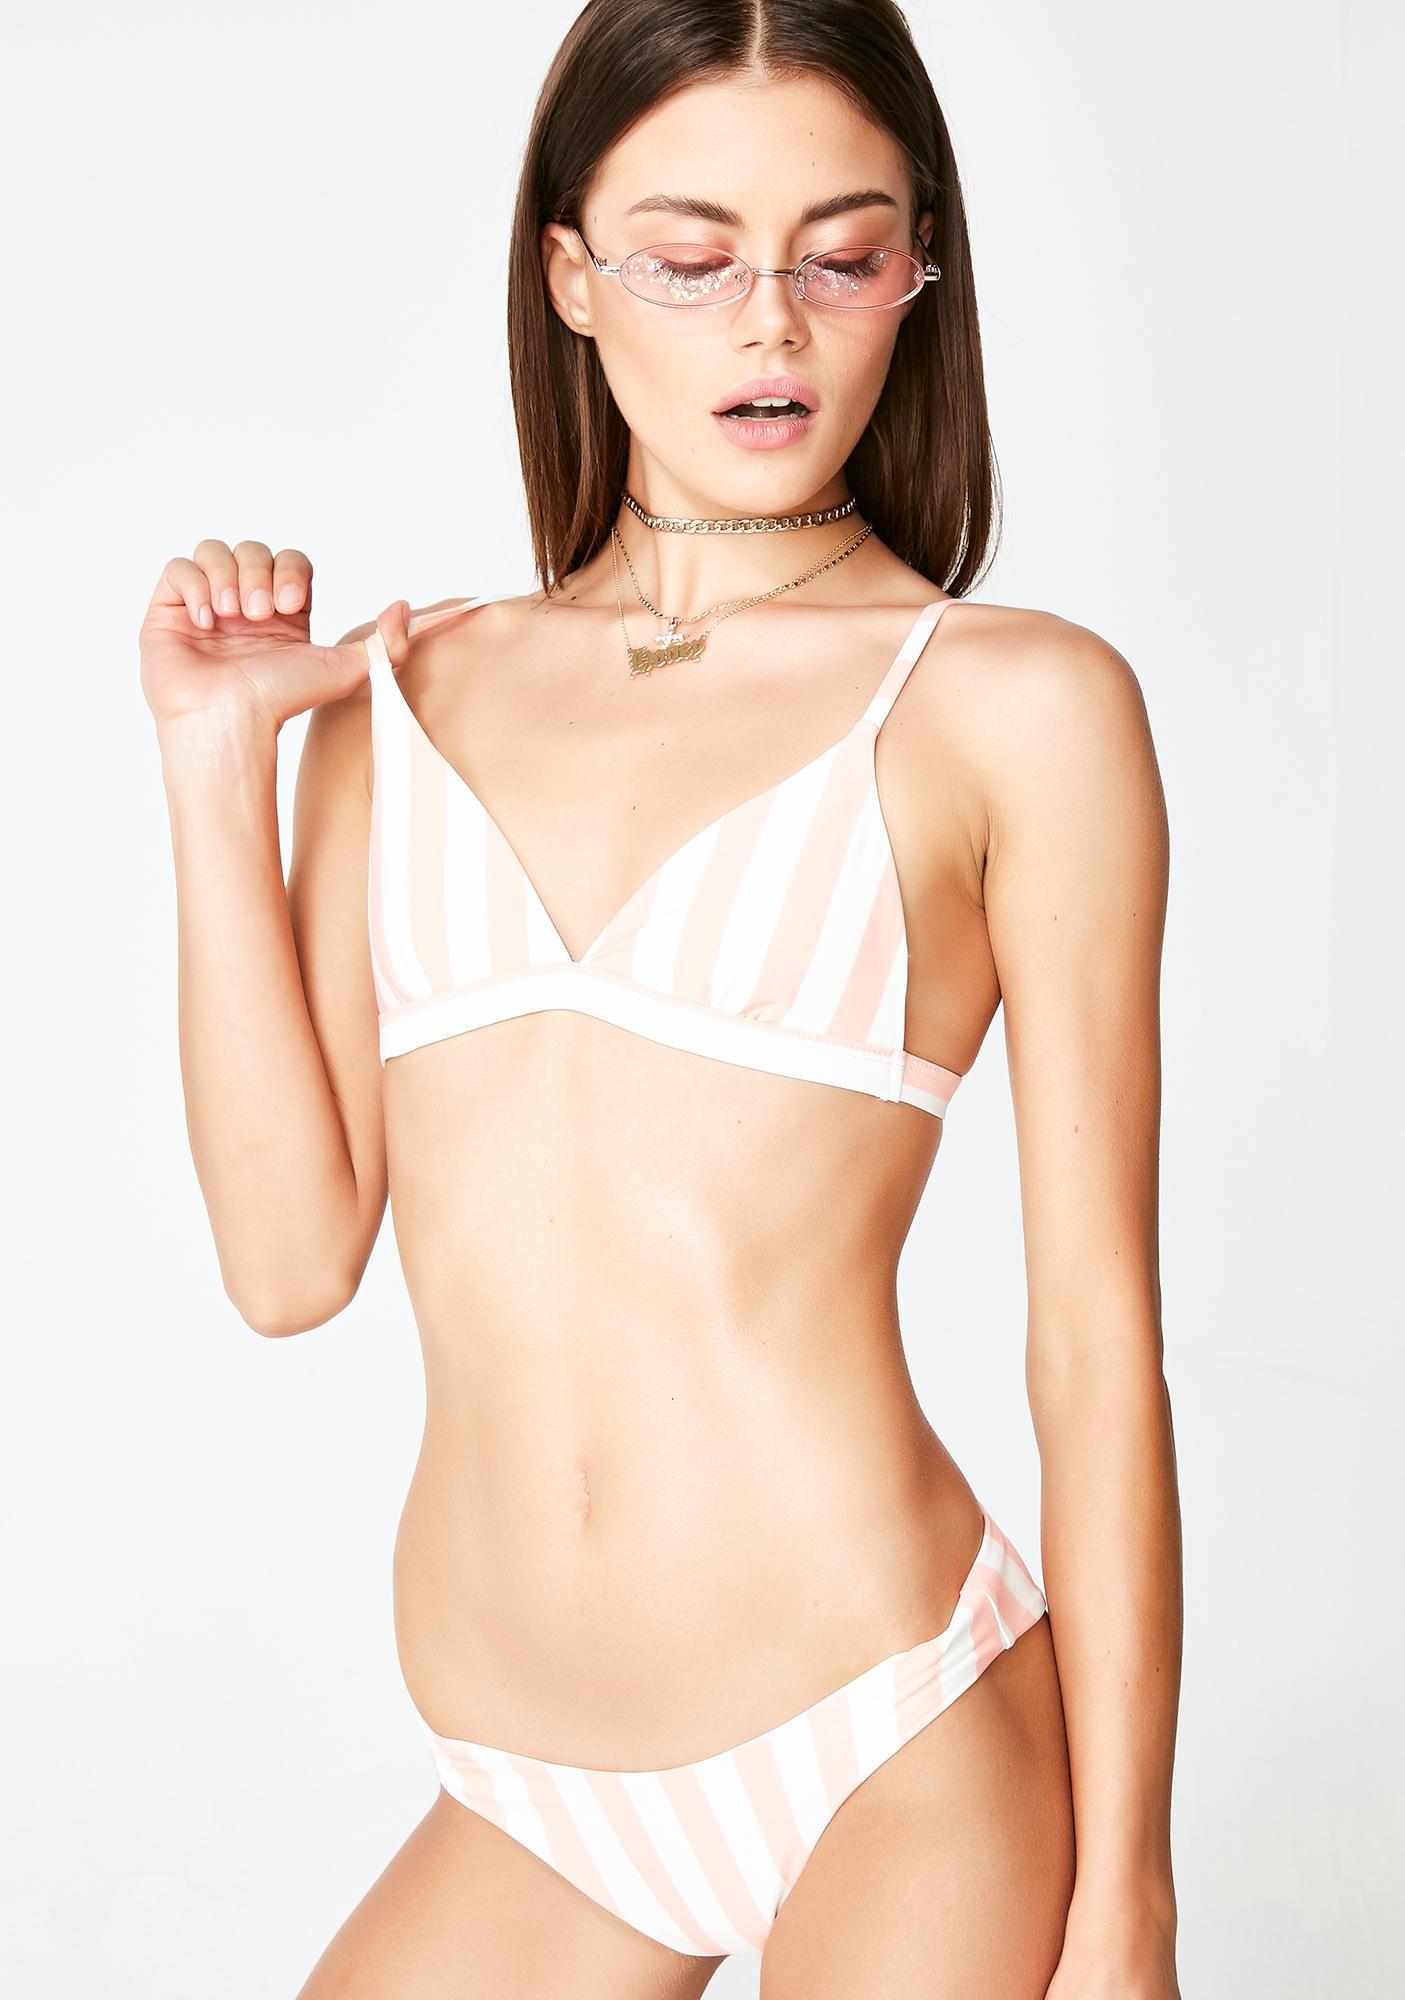 Dippin' Daisy's Gumdrop Lollipop Bikini Top